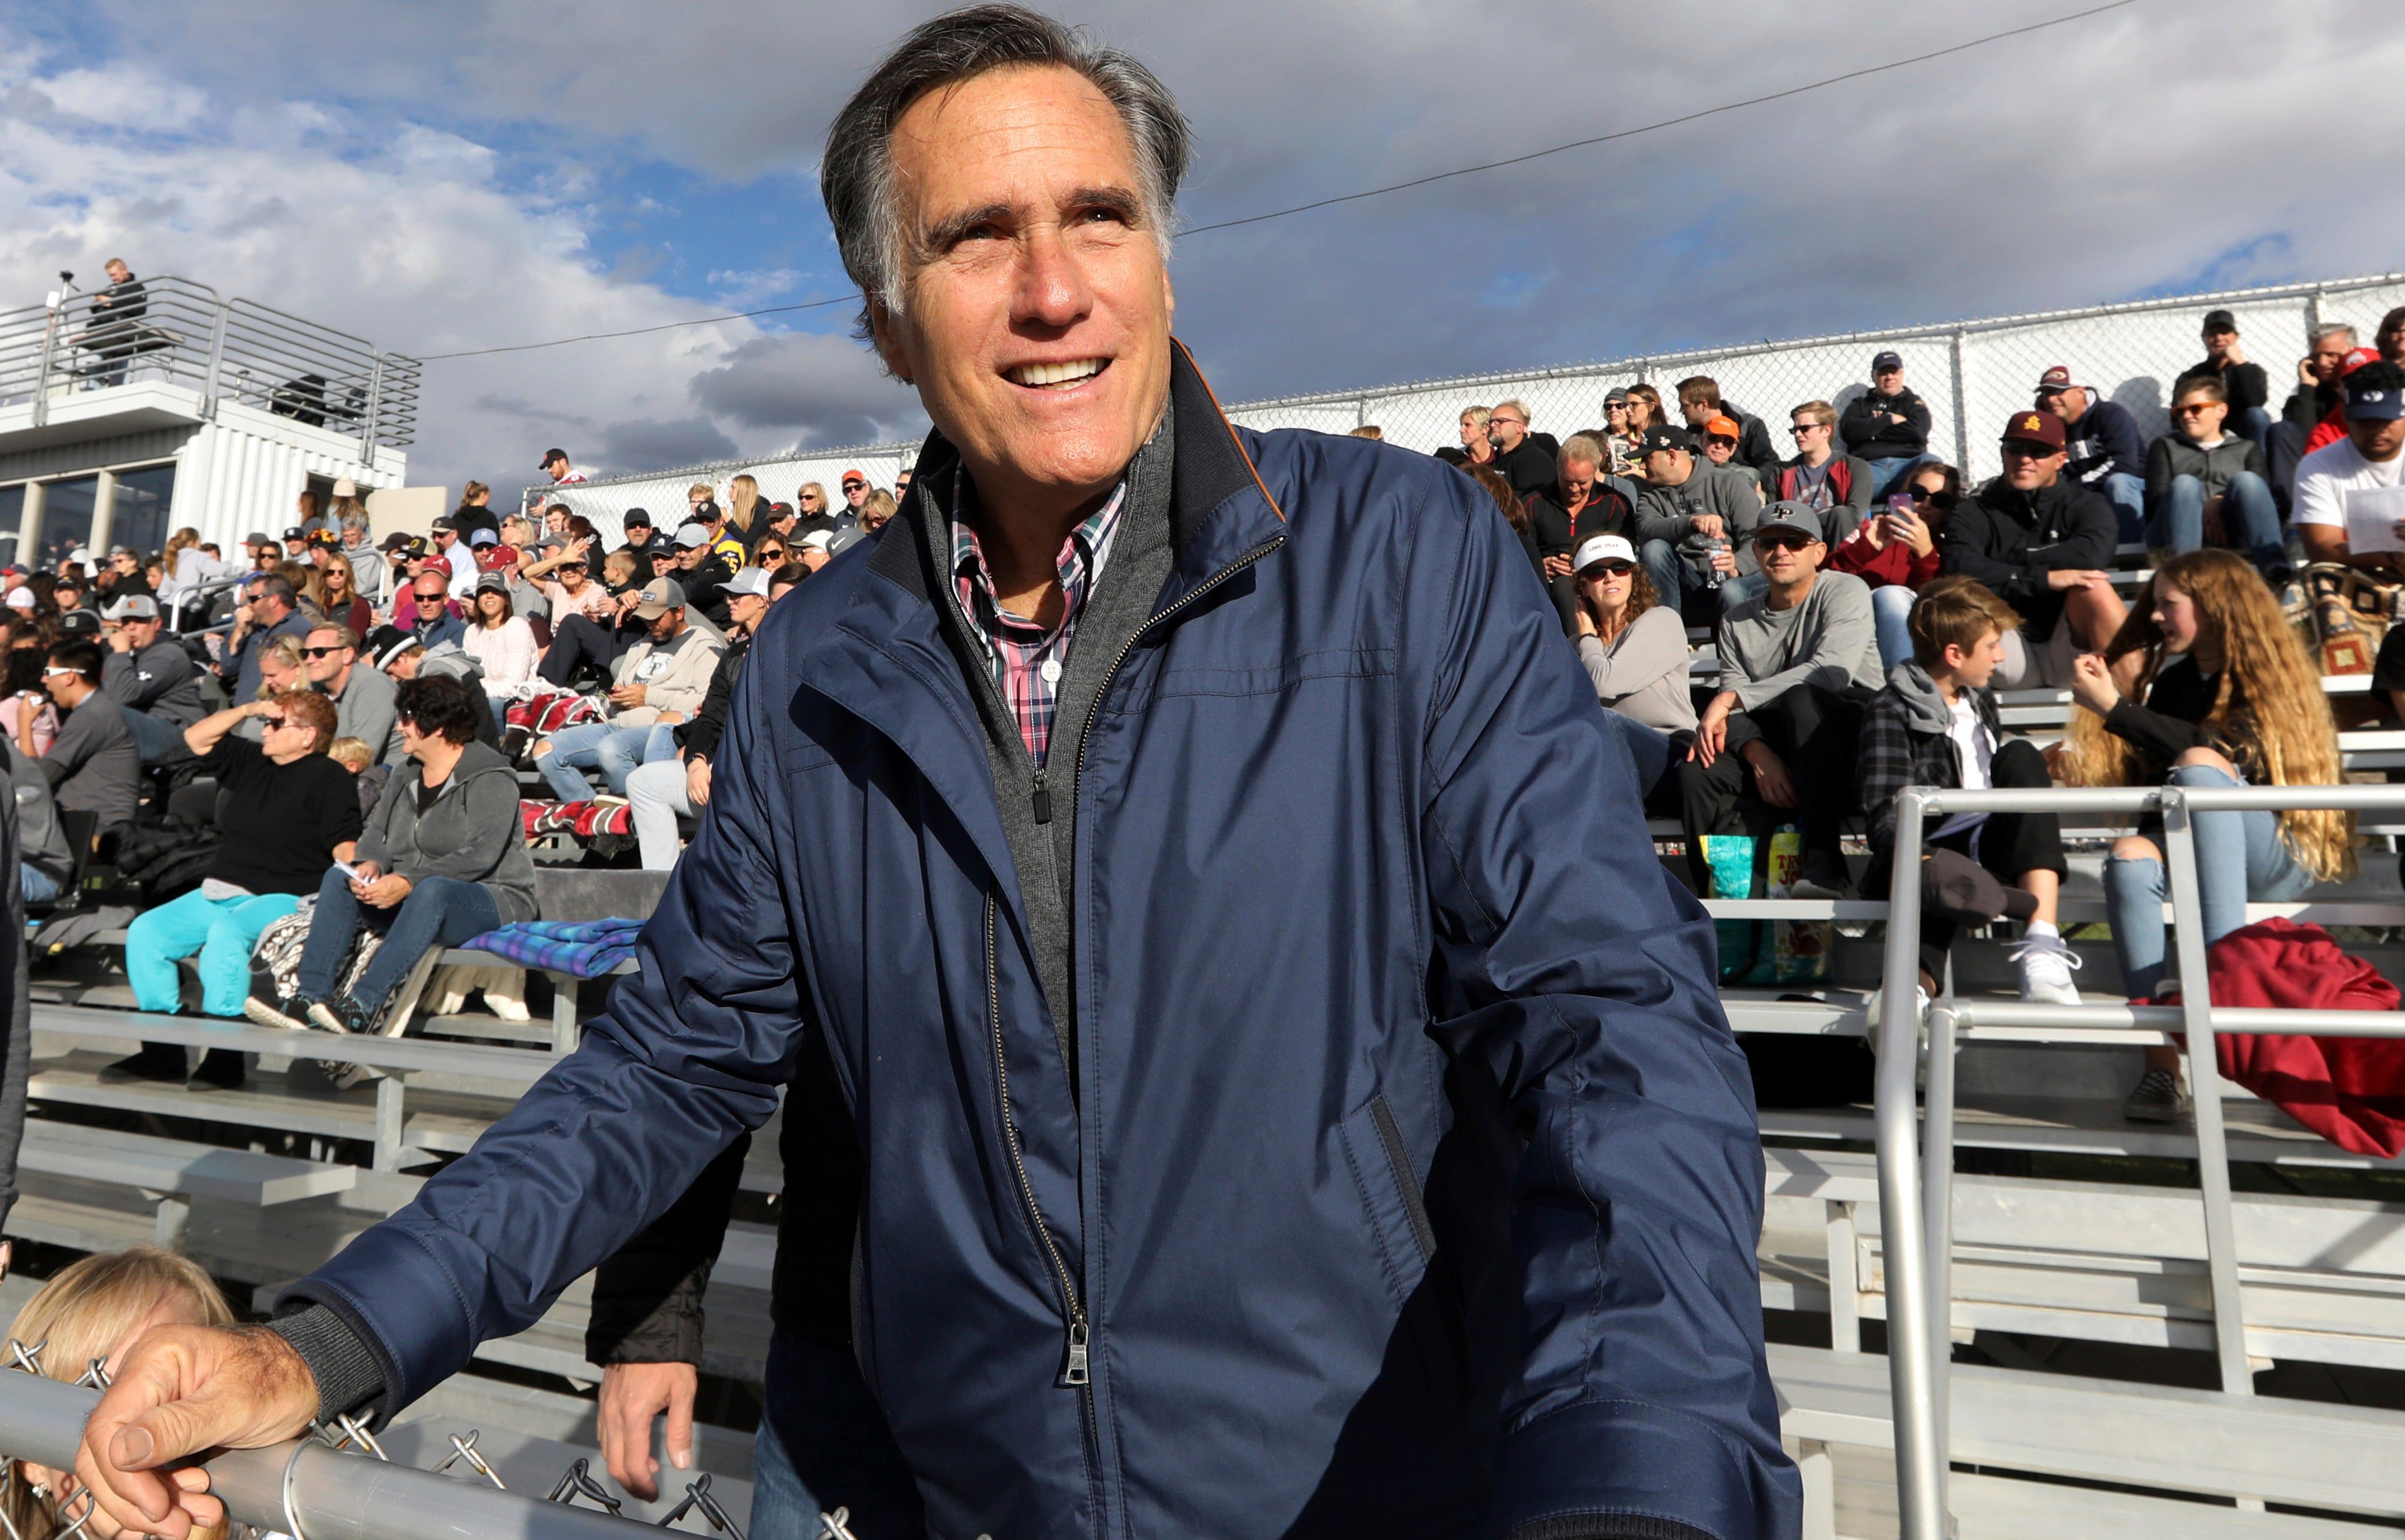 Mitt Romney Utah Football Game Profile Image